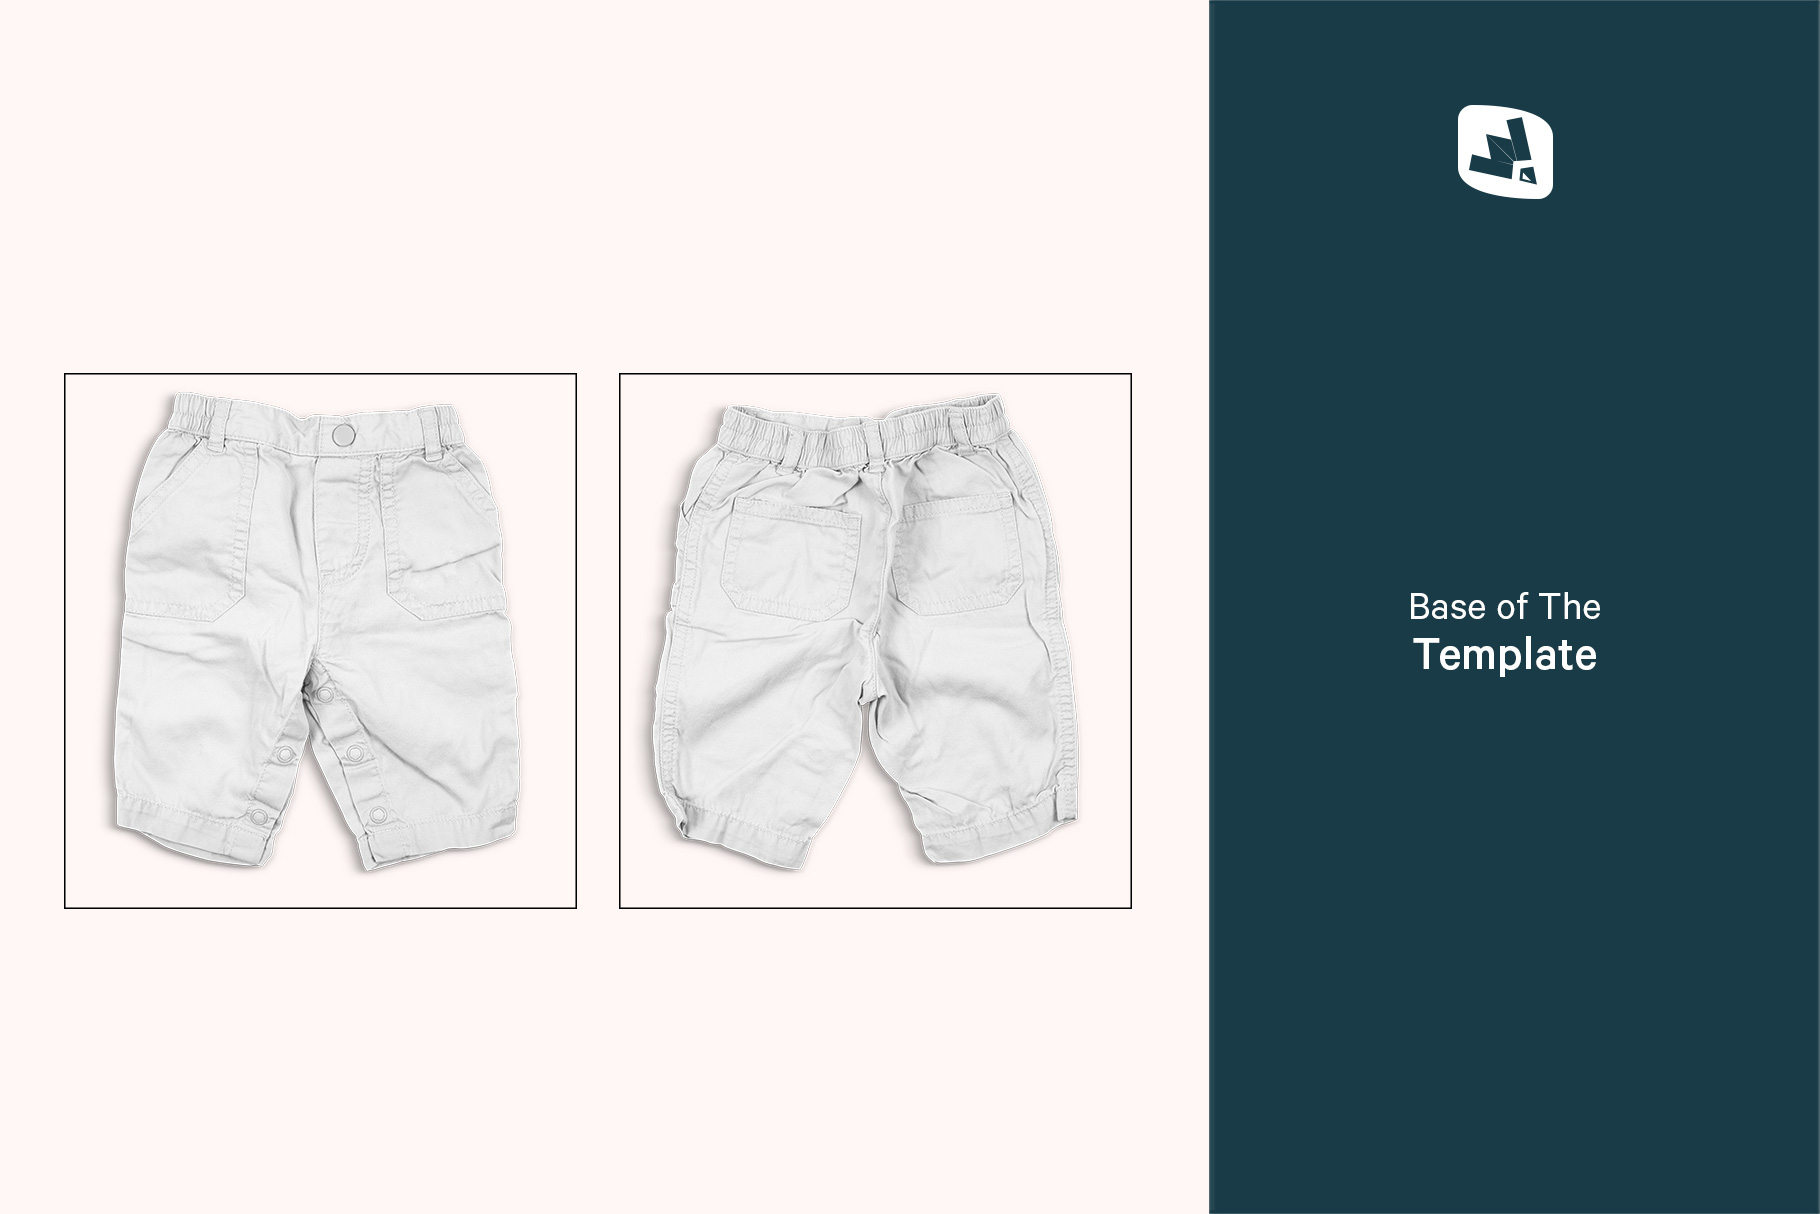 base image of the trendy infant cargo pants mockup